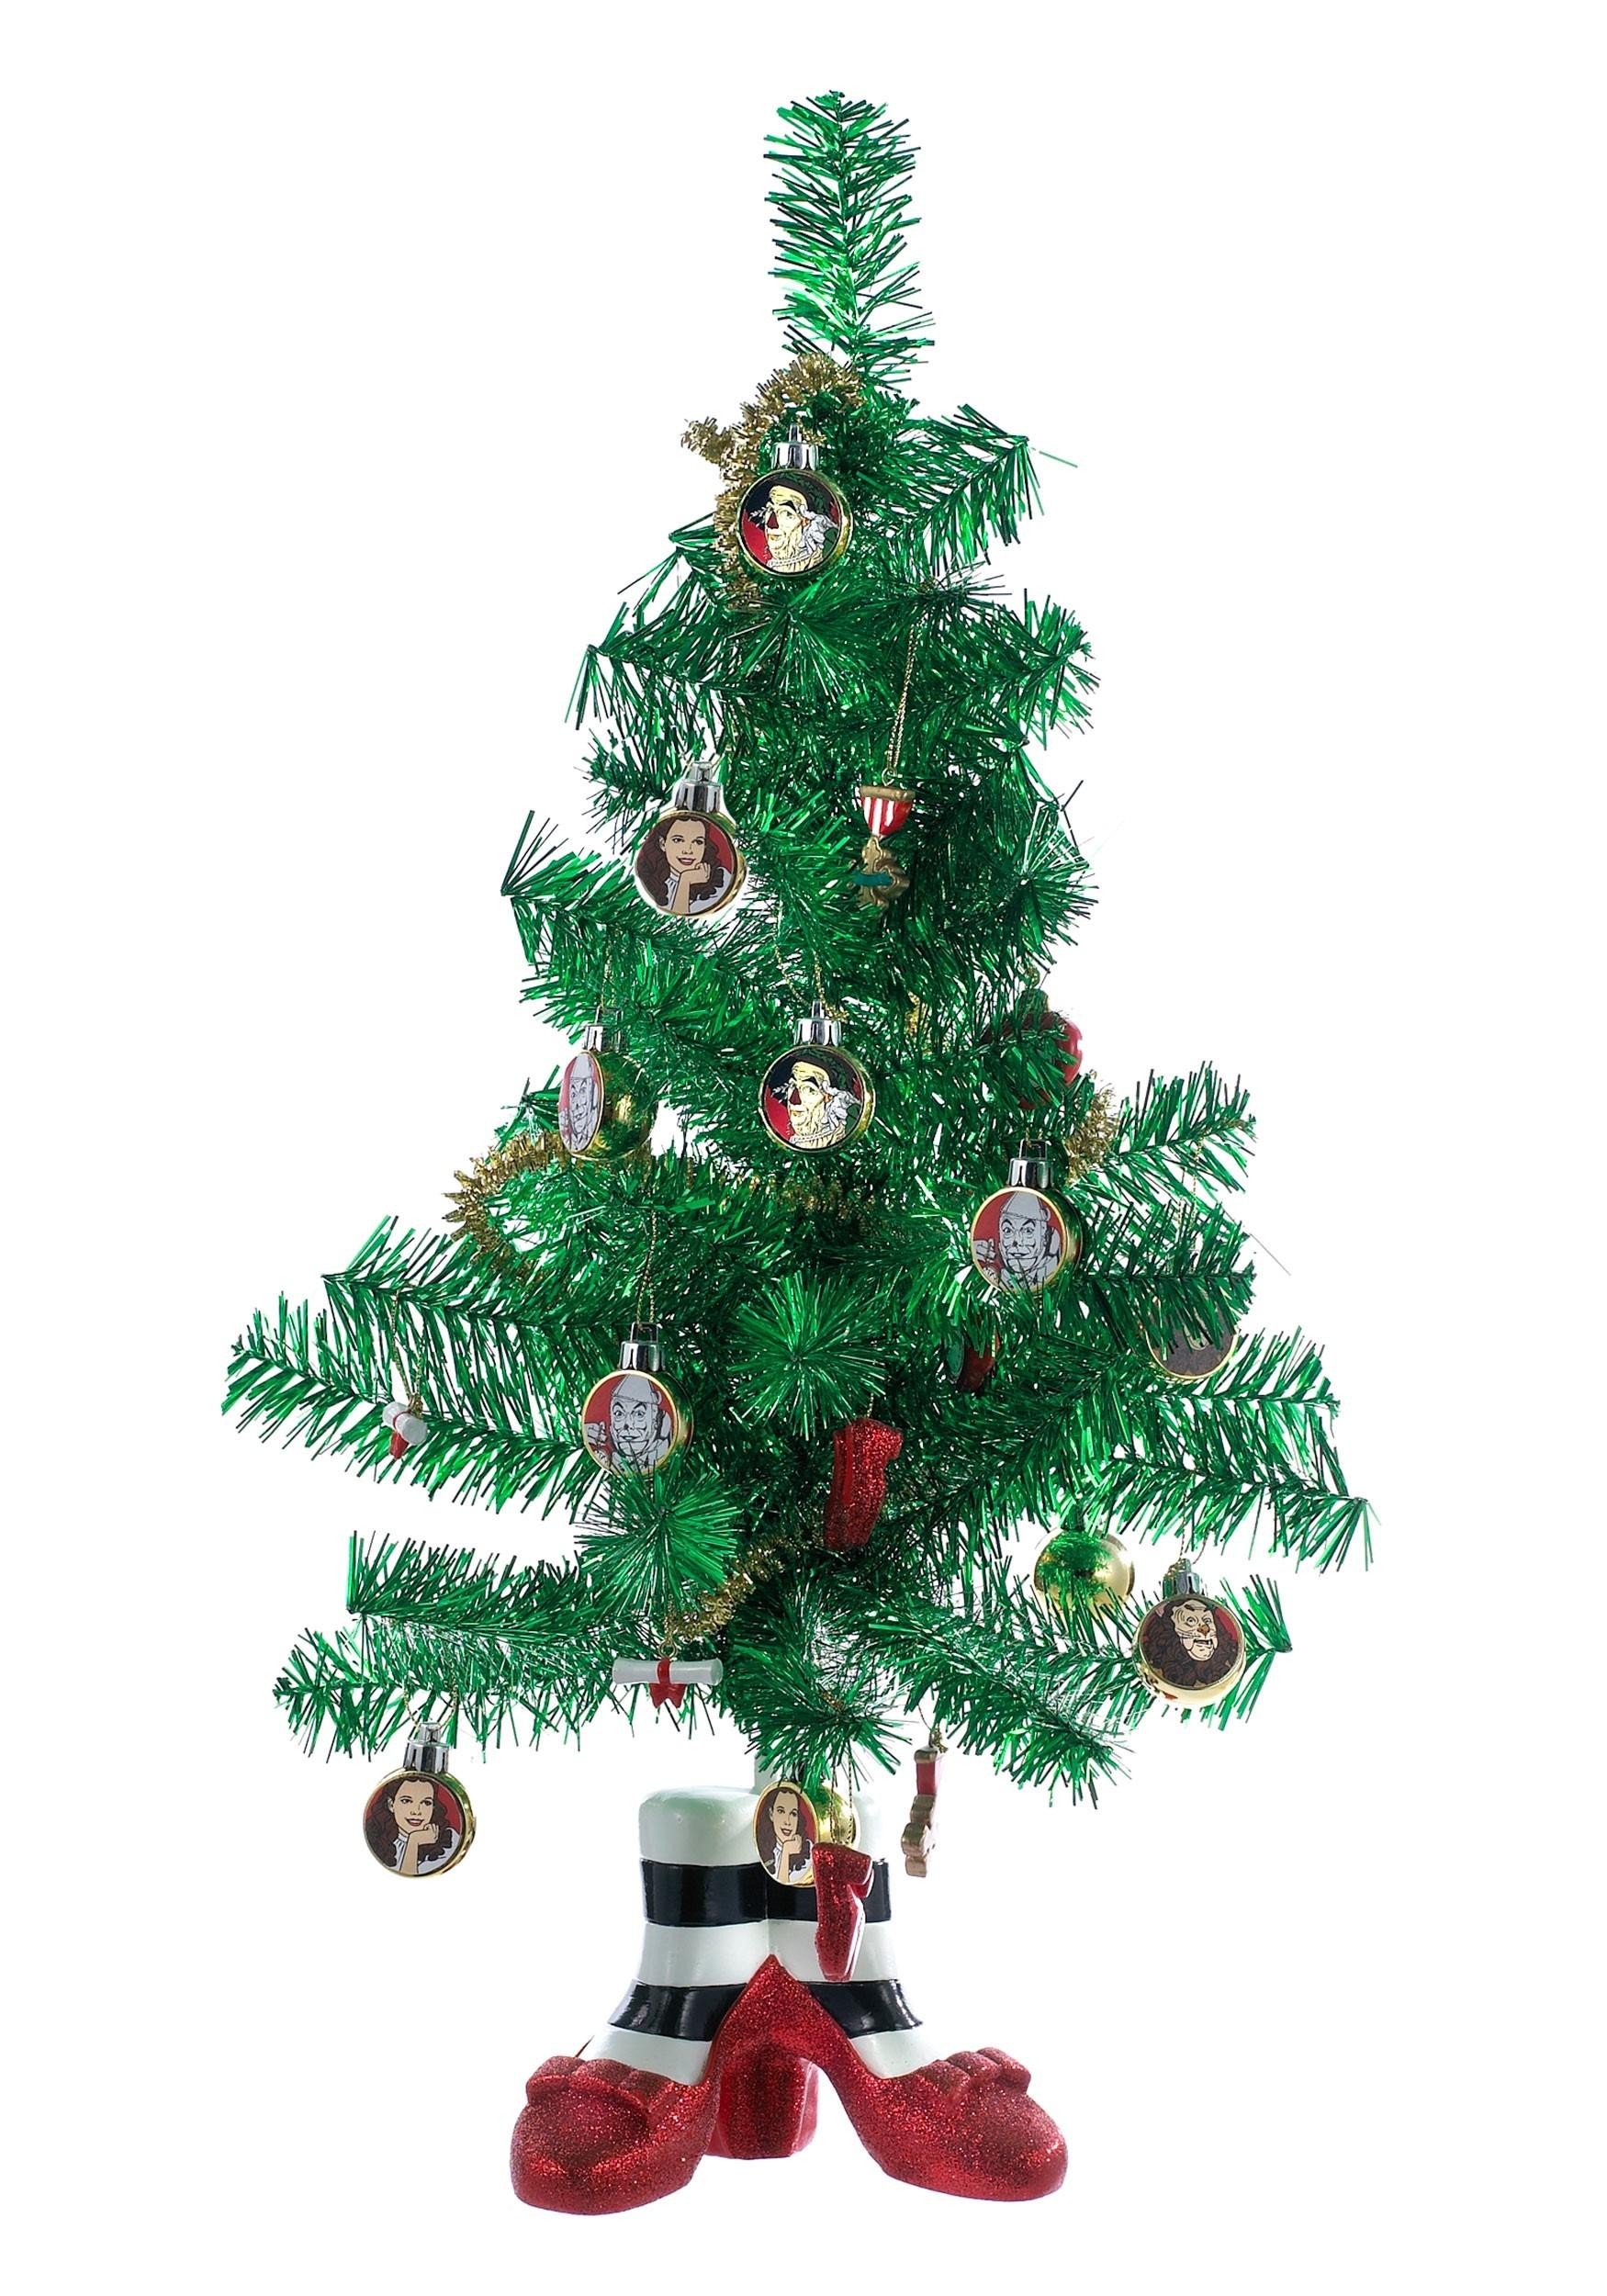 Wizard of Oz Tinsel Miniature Christmas Tree